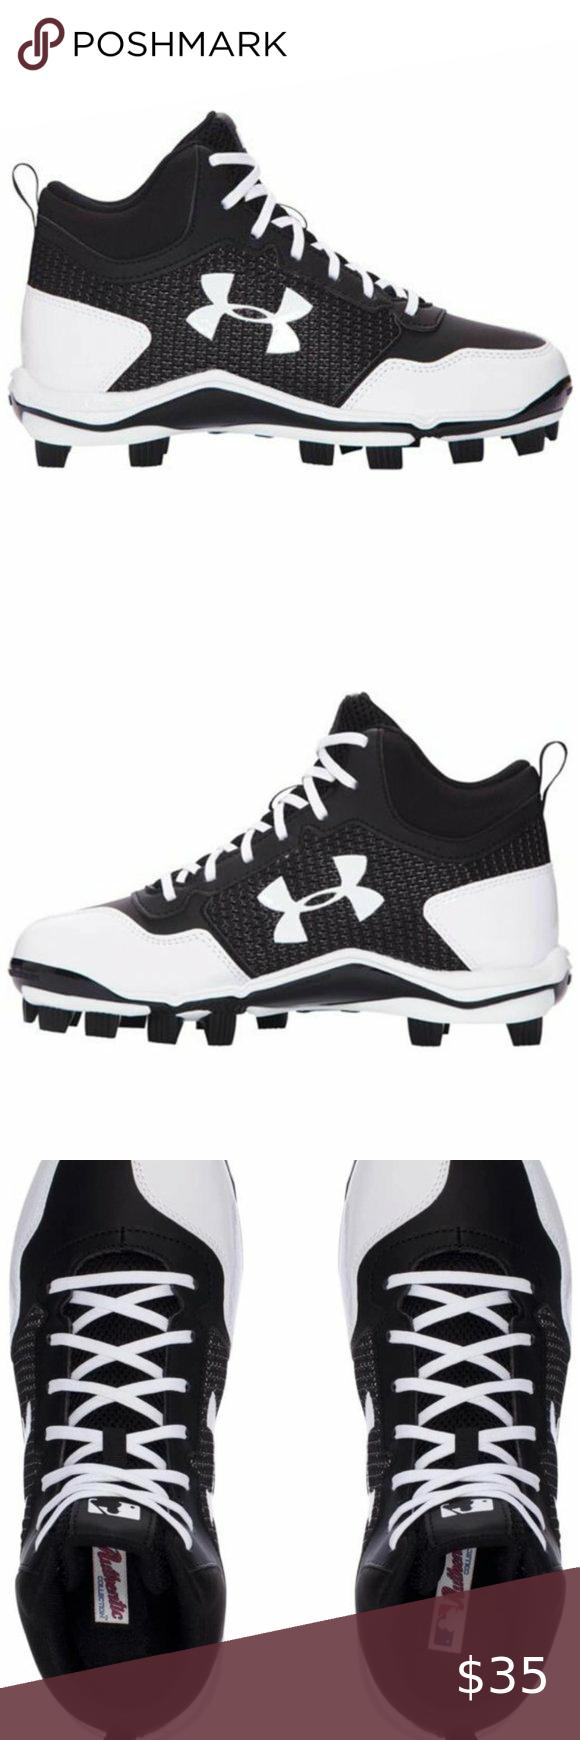 boys baseball cleats size 6.5